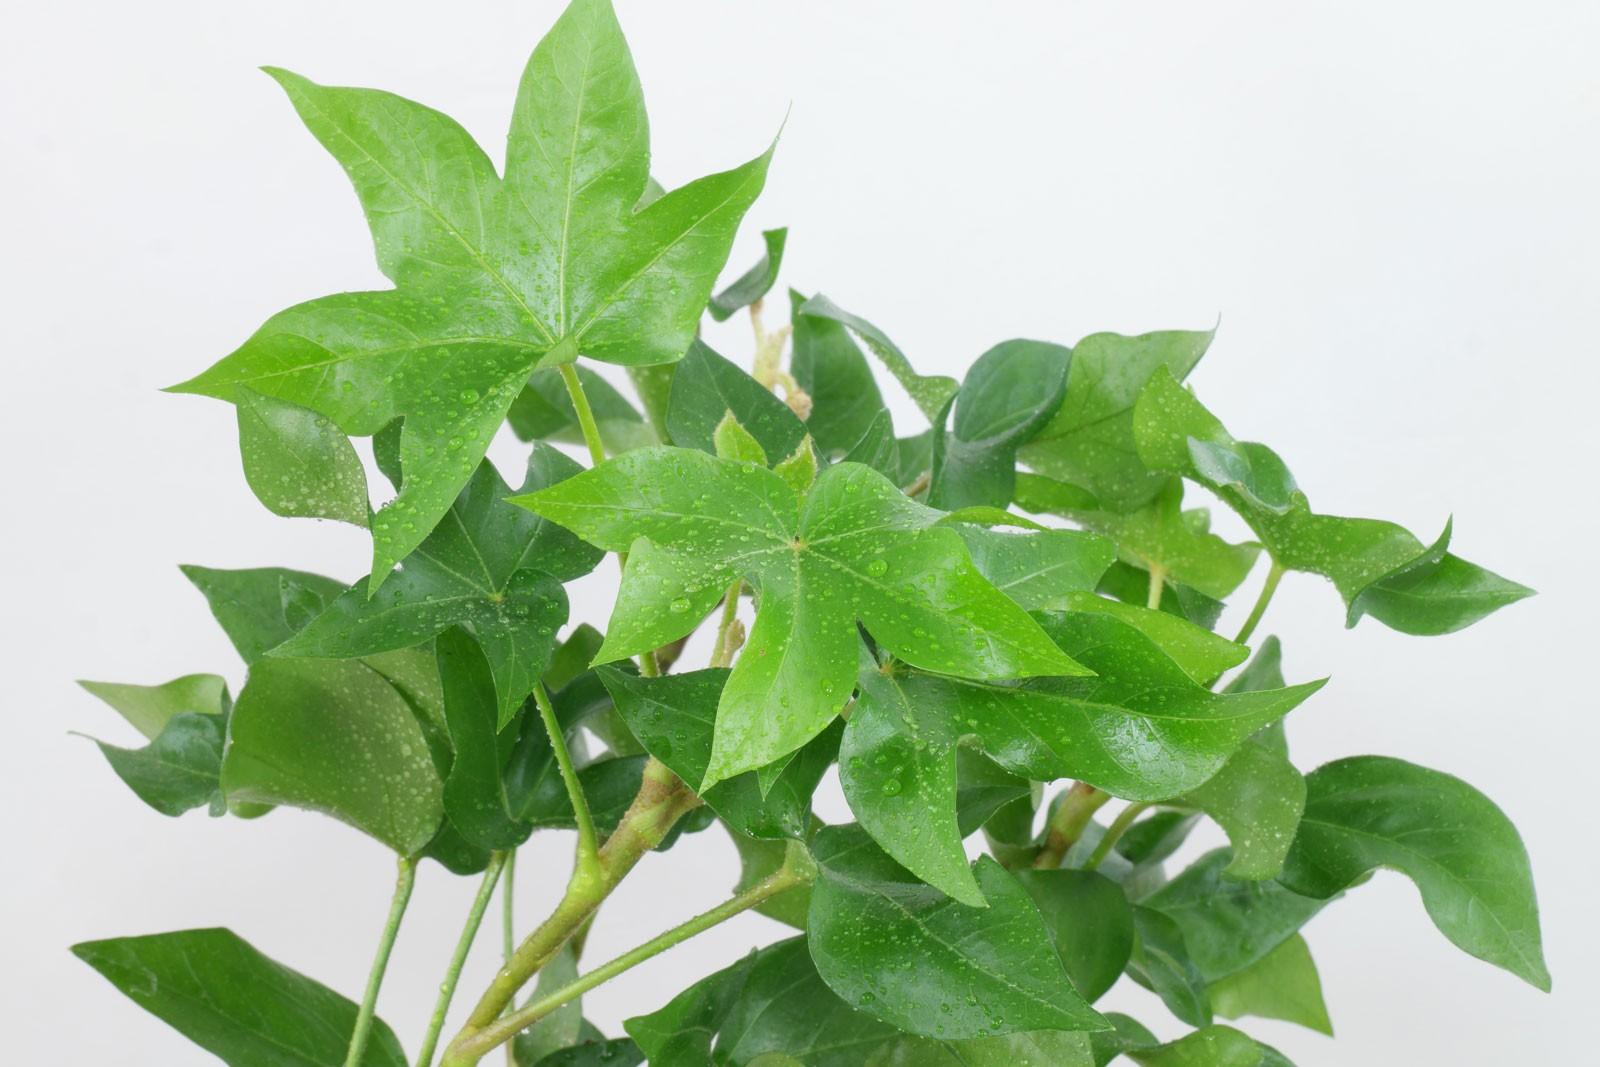 Фатсхедера: выращивание и уход в домашних условиях,фото,видео